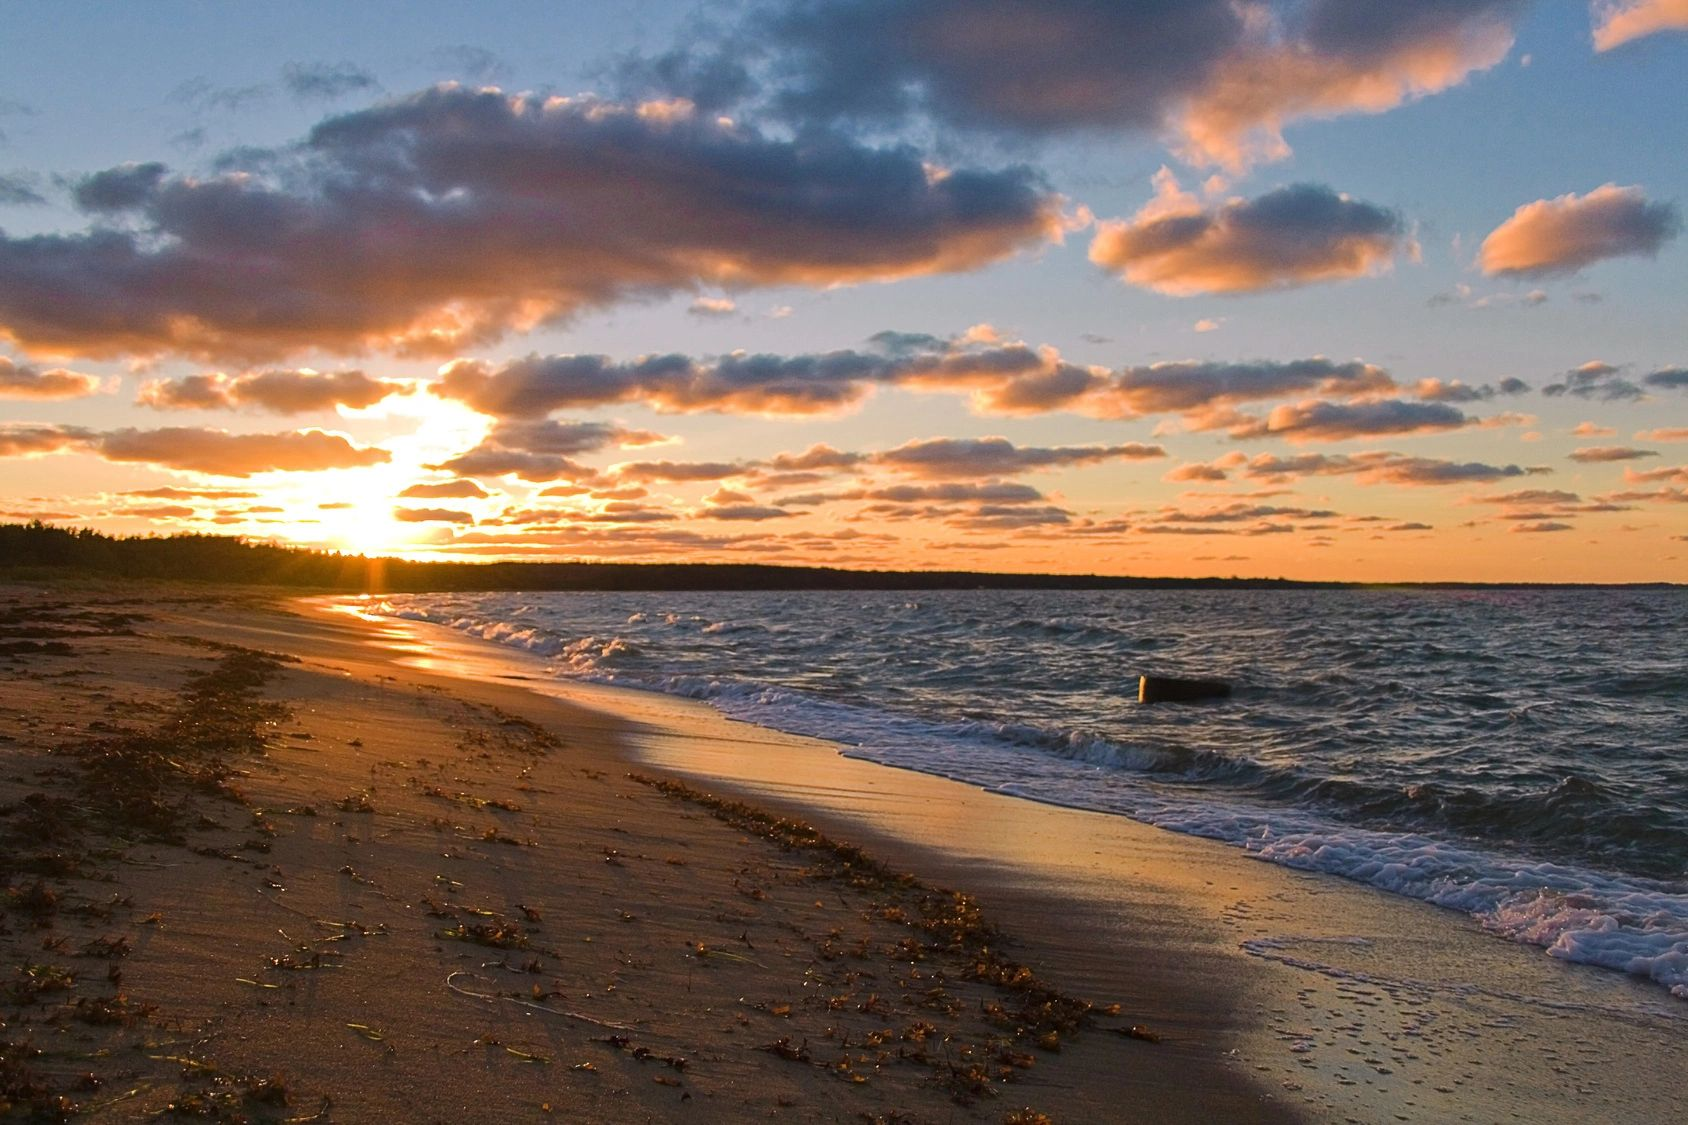 Rumba on the beach